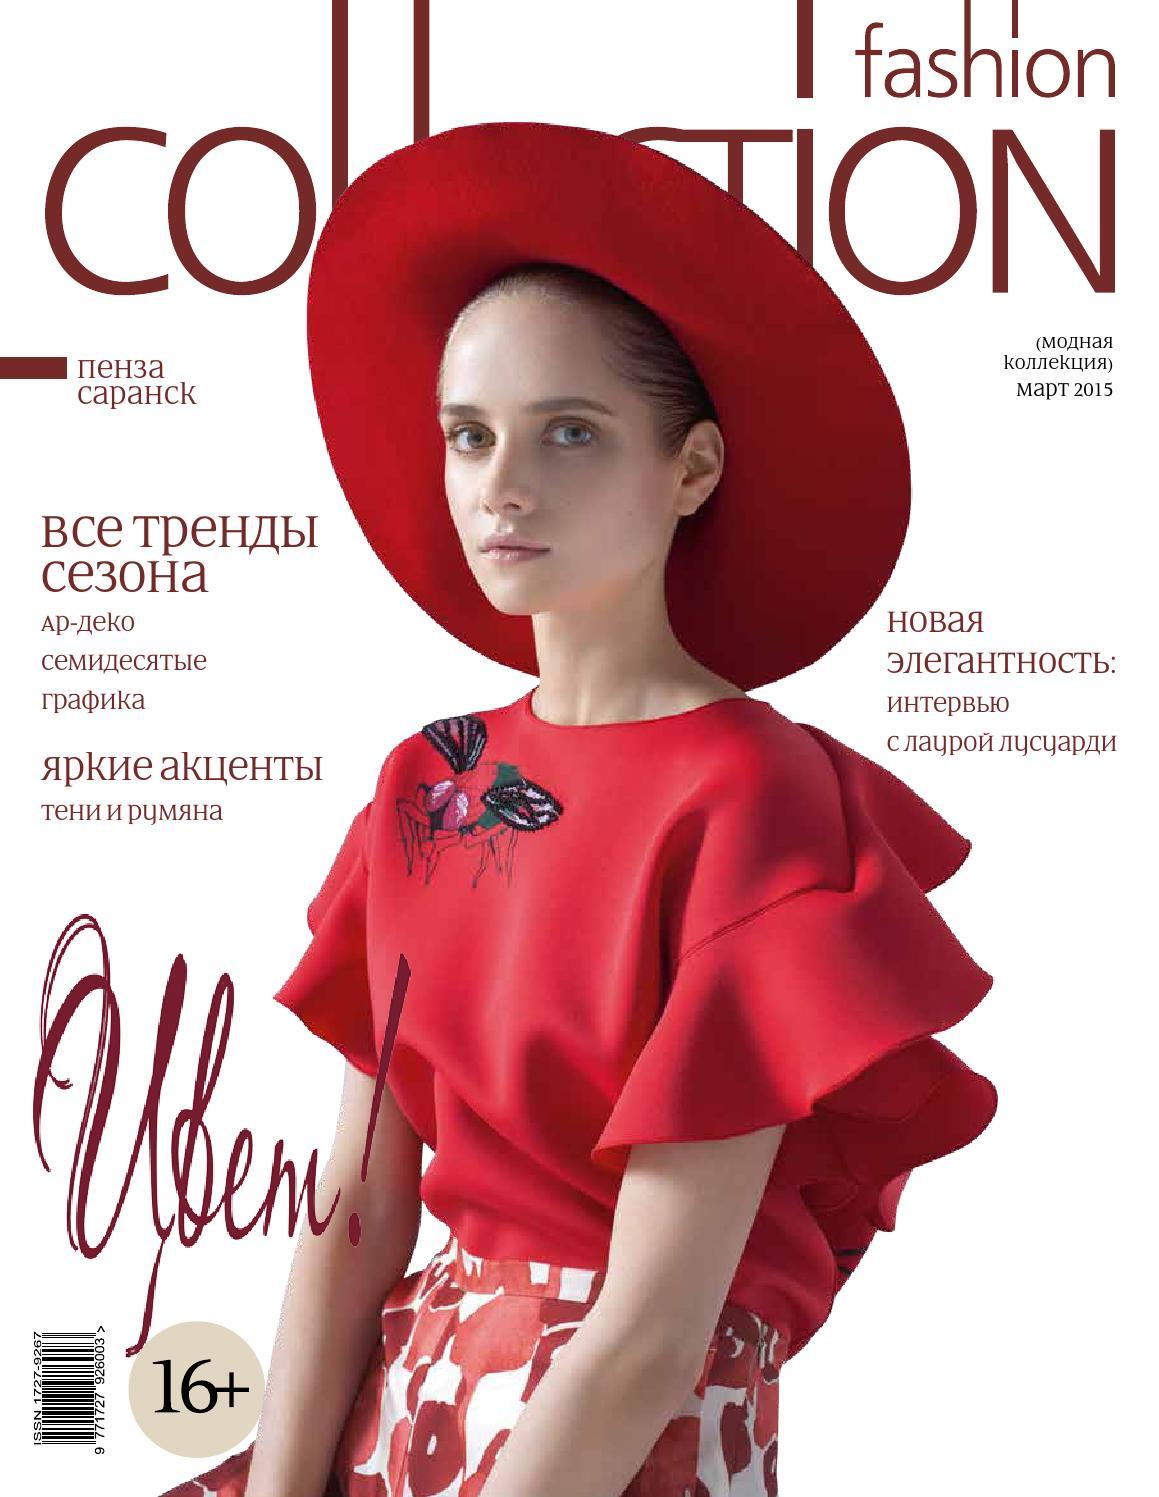 Март 2015 by Fashion Collection Пенза - issuu 5207ab9b2bf